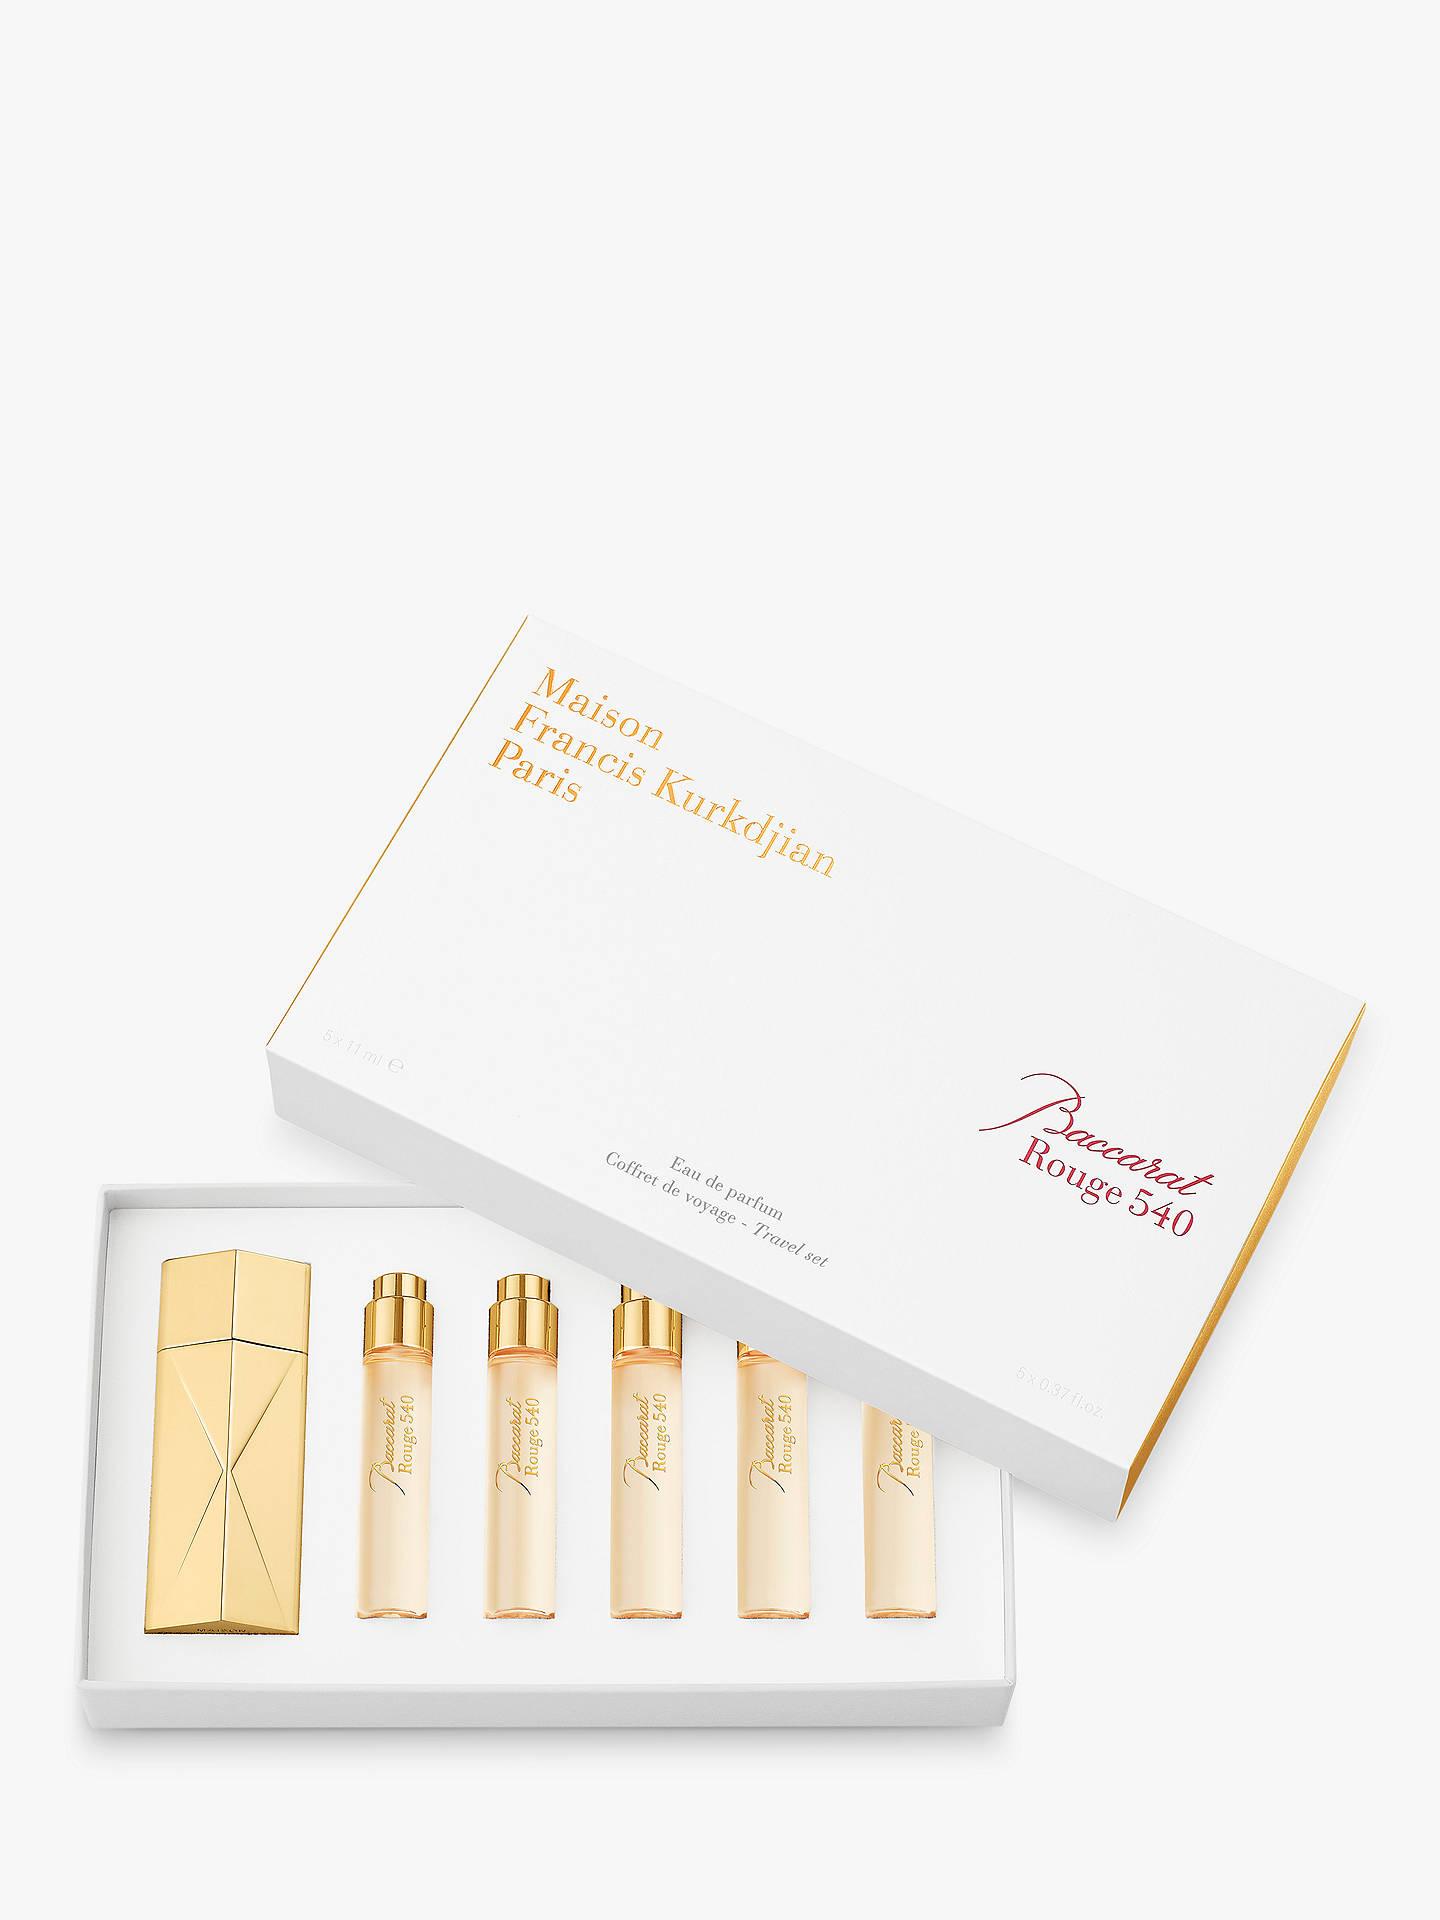 Maison Francis Kurkdjian Baccarat Rouge 540 Eau De Parfum Travel